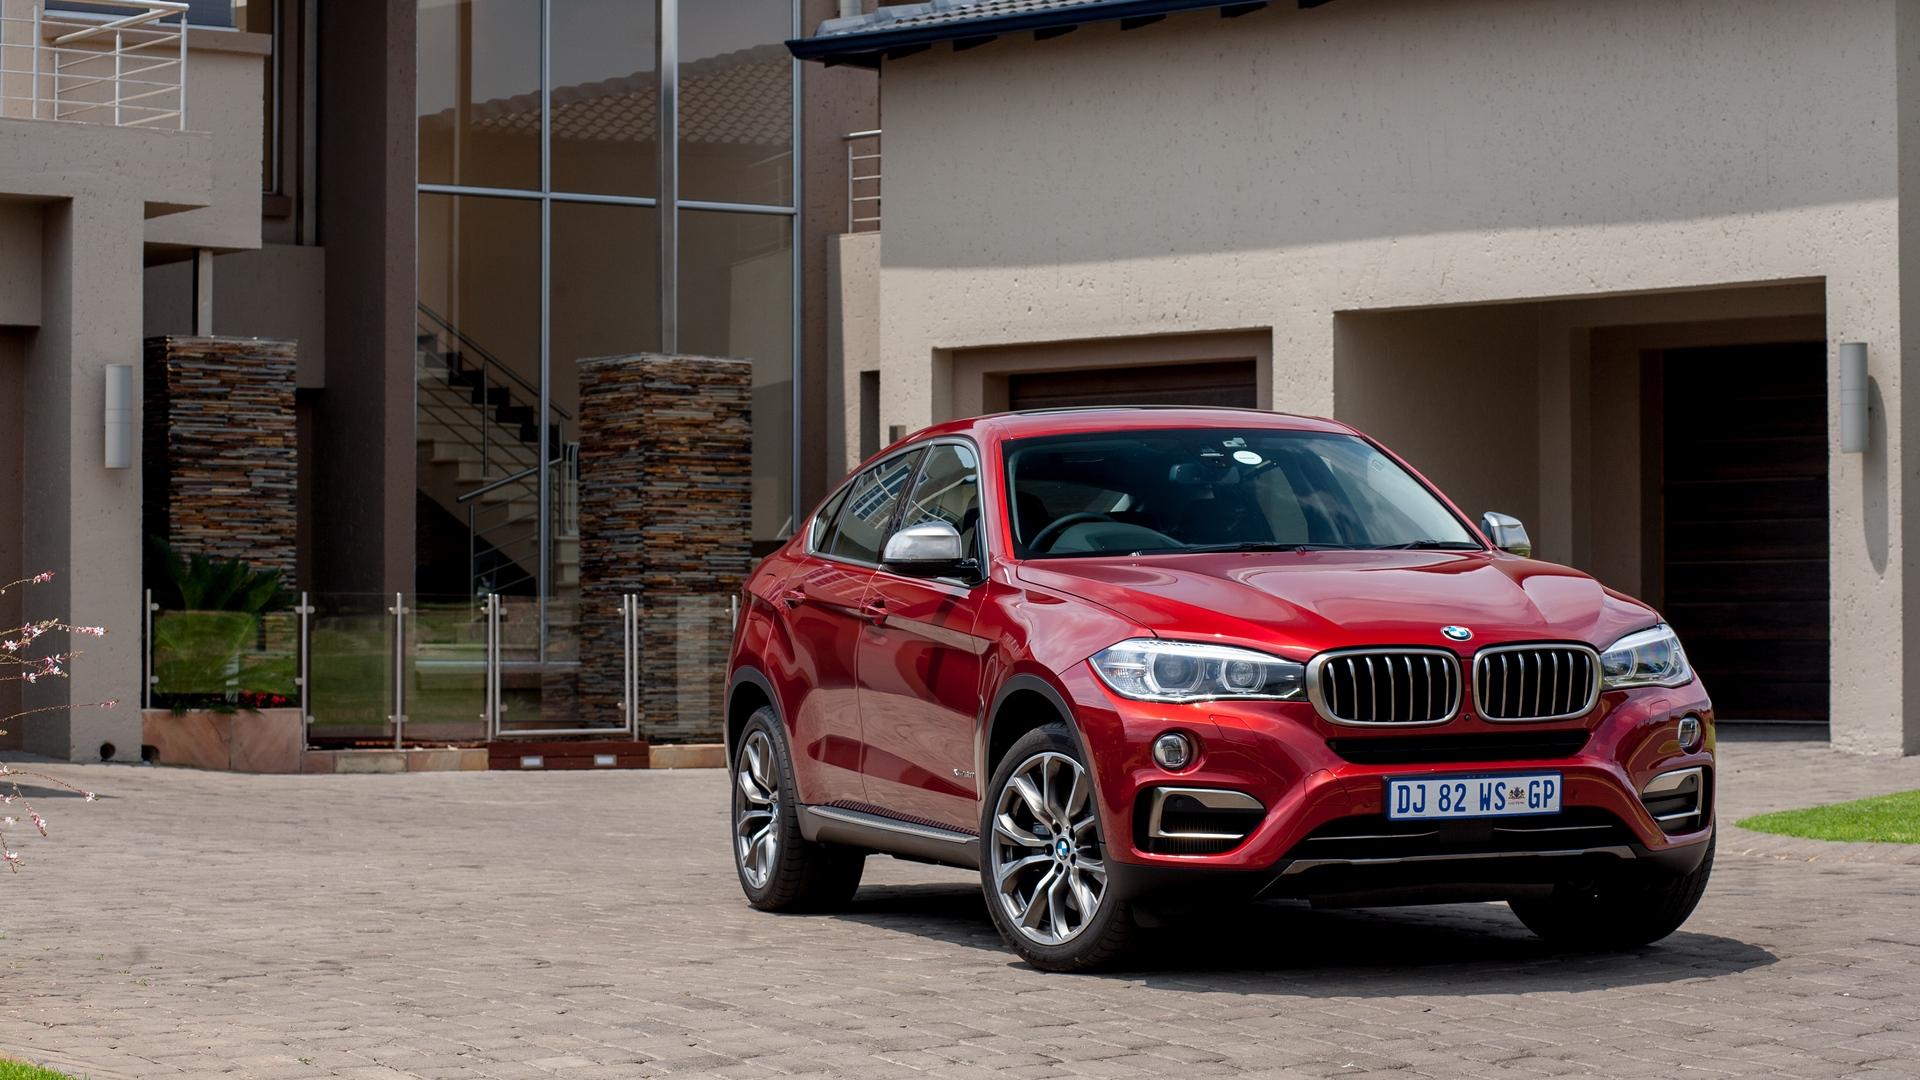 31+ BMW X6 Red Wallpapers on WallpaperSafari